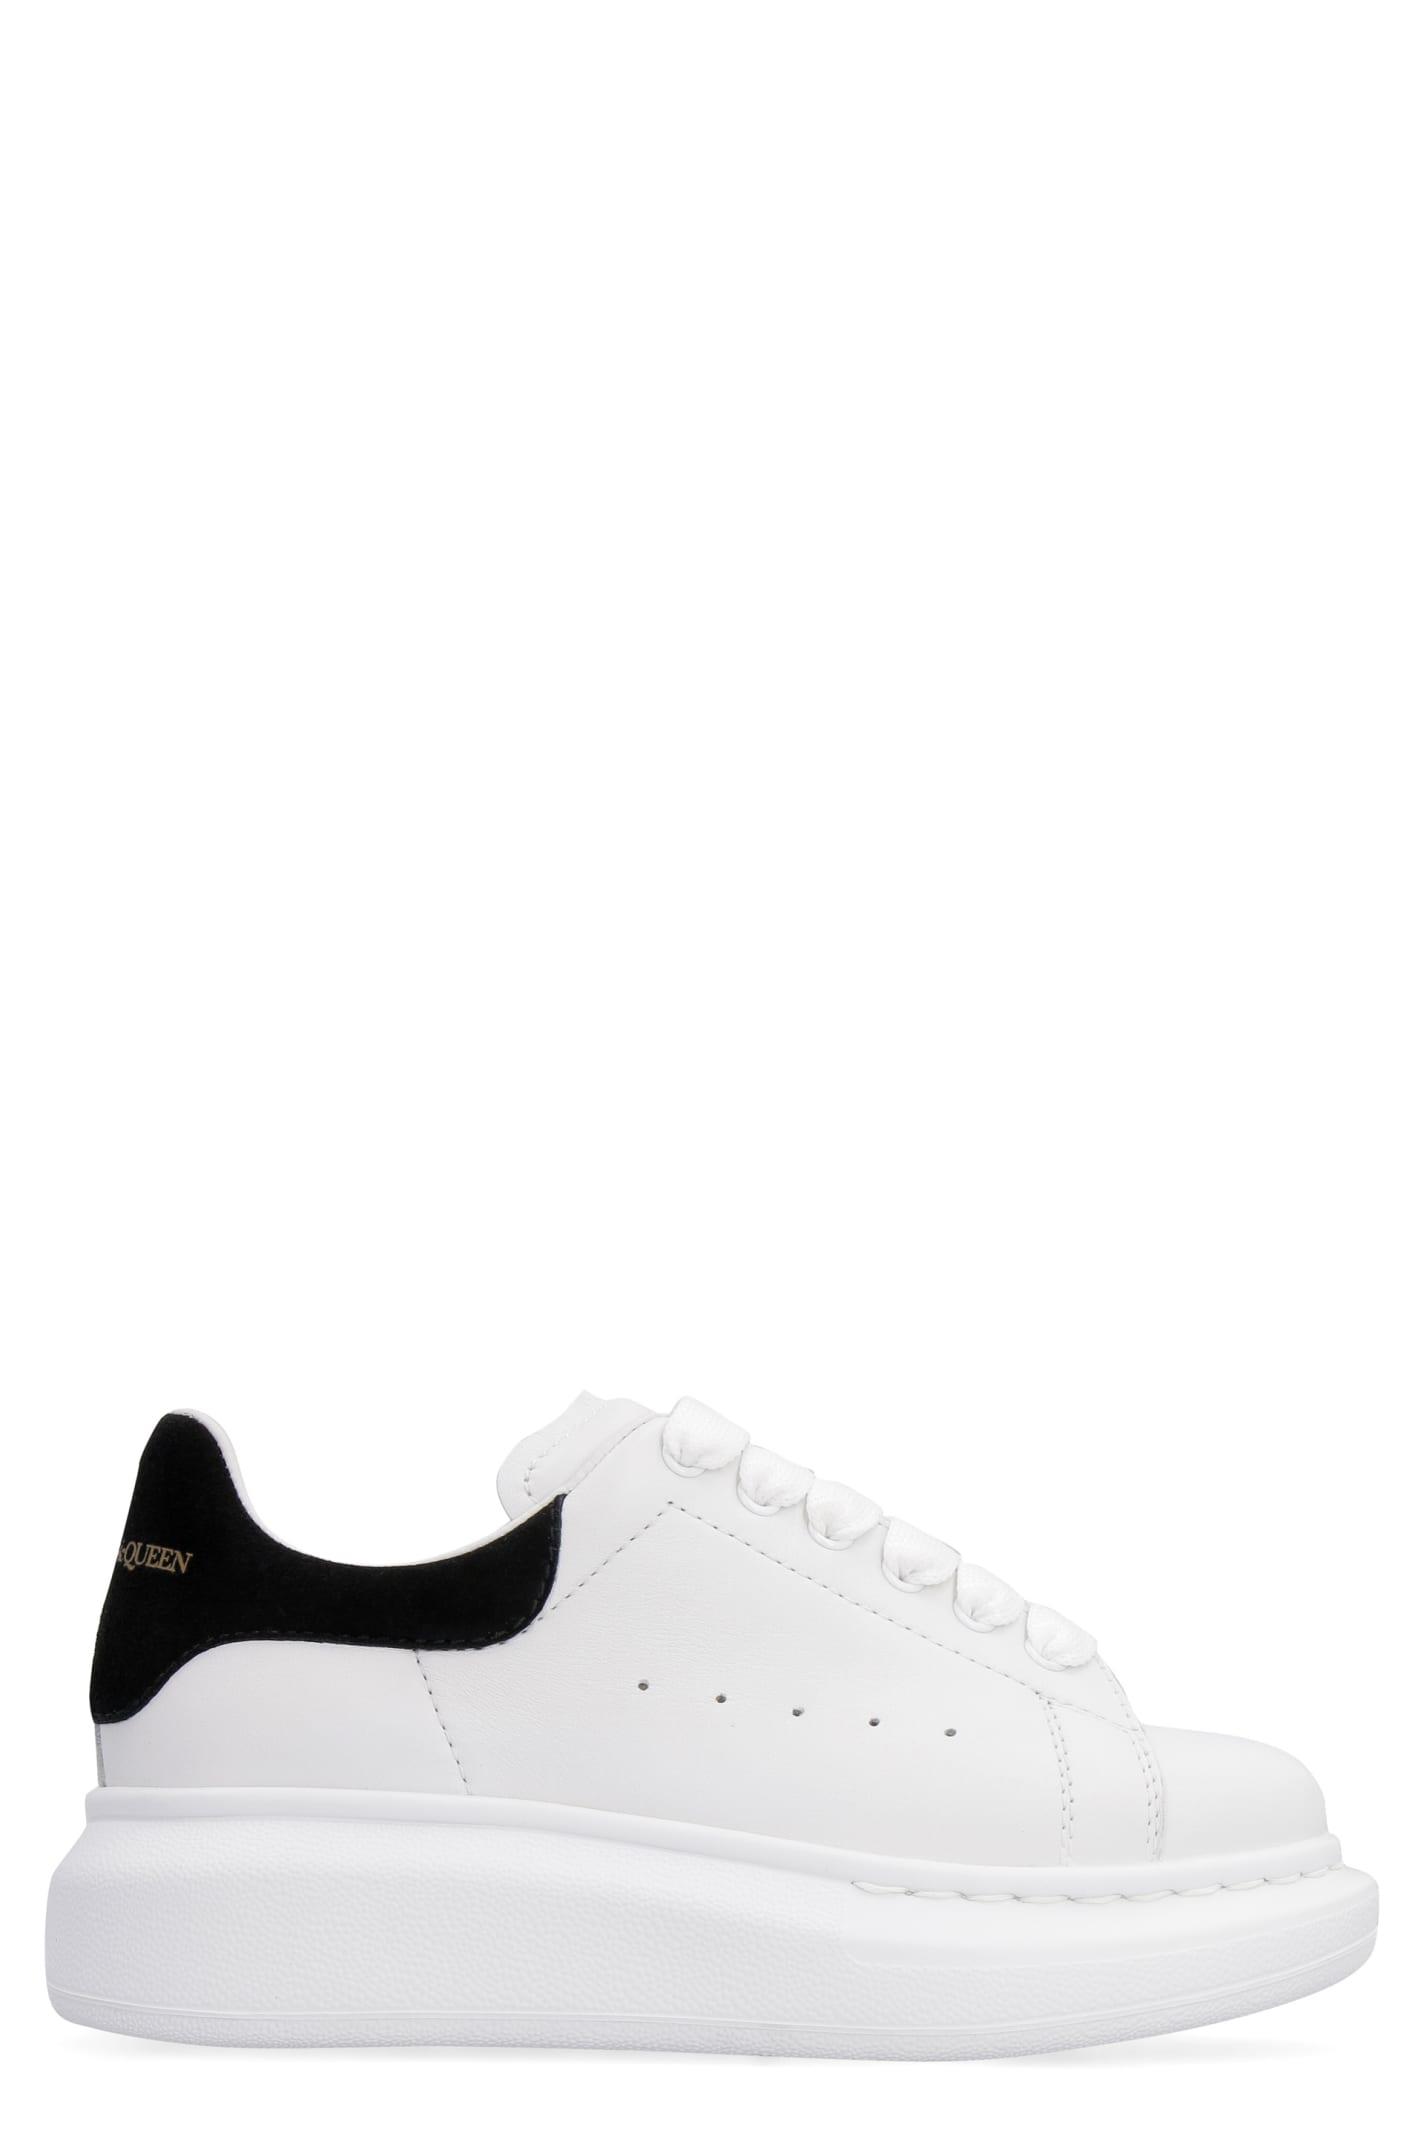 Alexander McQueen Extended Sole Oversized Sneakers